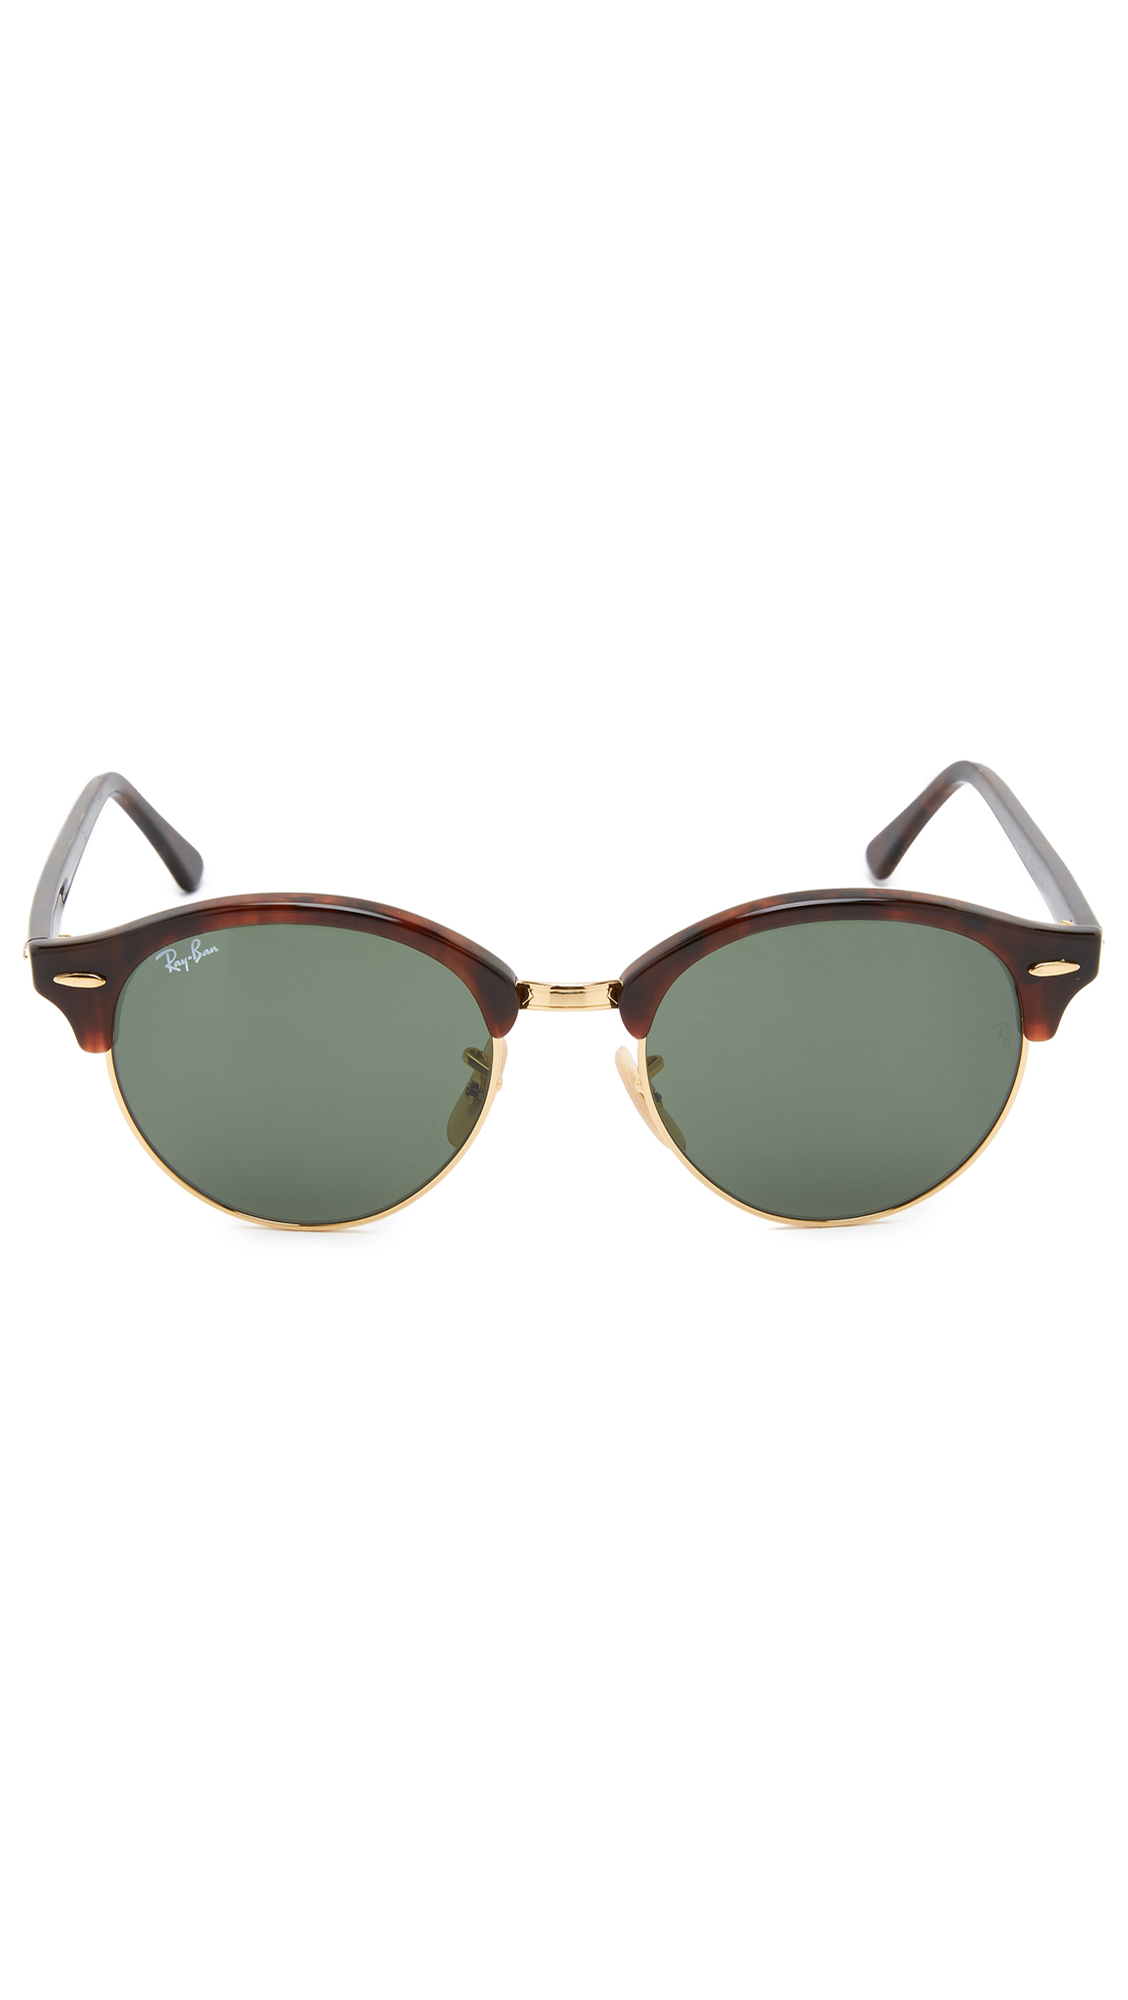 a8e83a38e0 ... greece ray ban club round sunglasses in brown for men lyst c2767 4b5a7